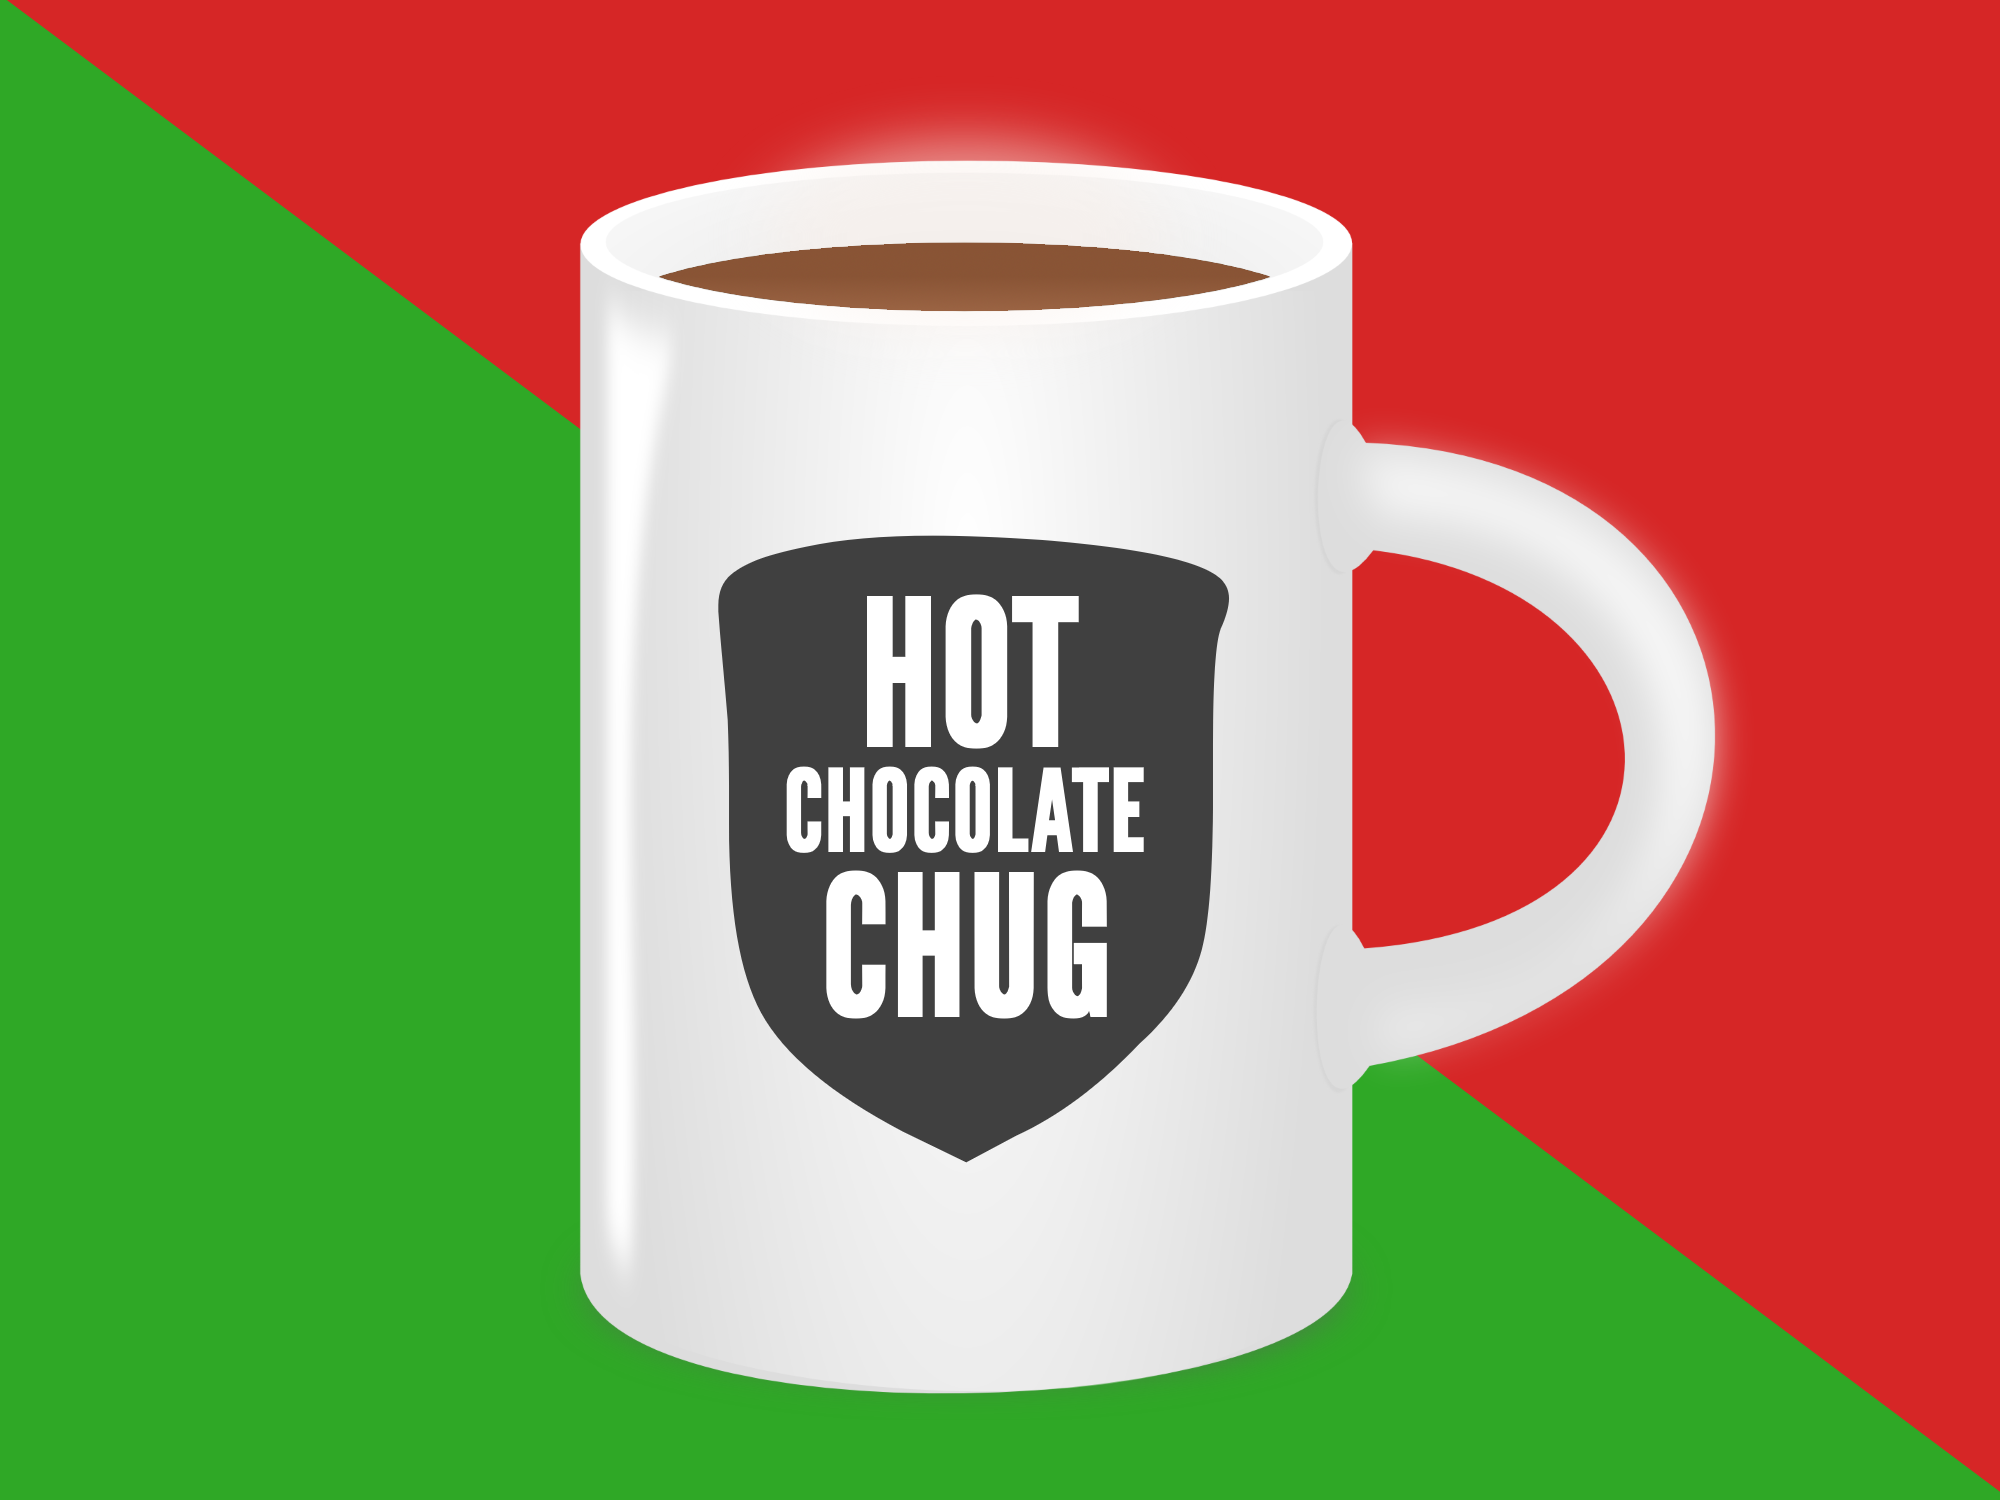 Hot Chocolate Chug Youth Group Collective